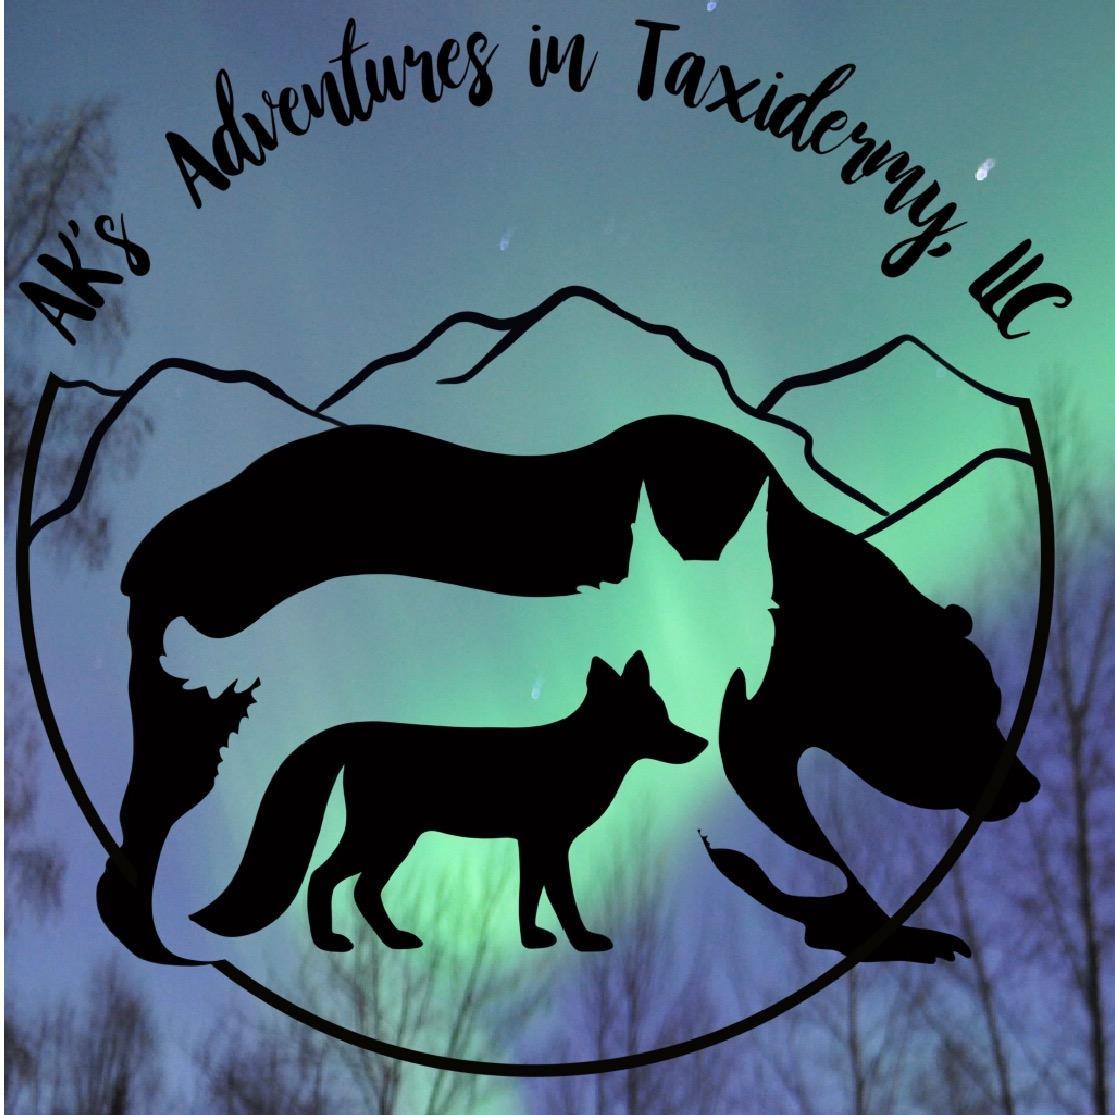 AK's Adventures in Taxidermy, LLC image 9